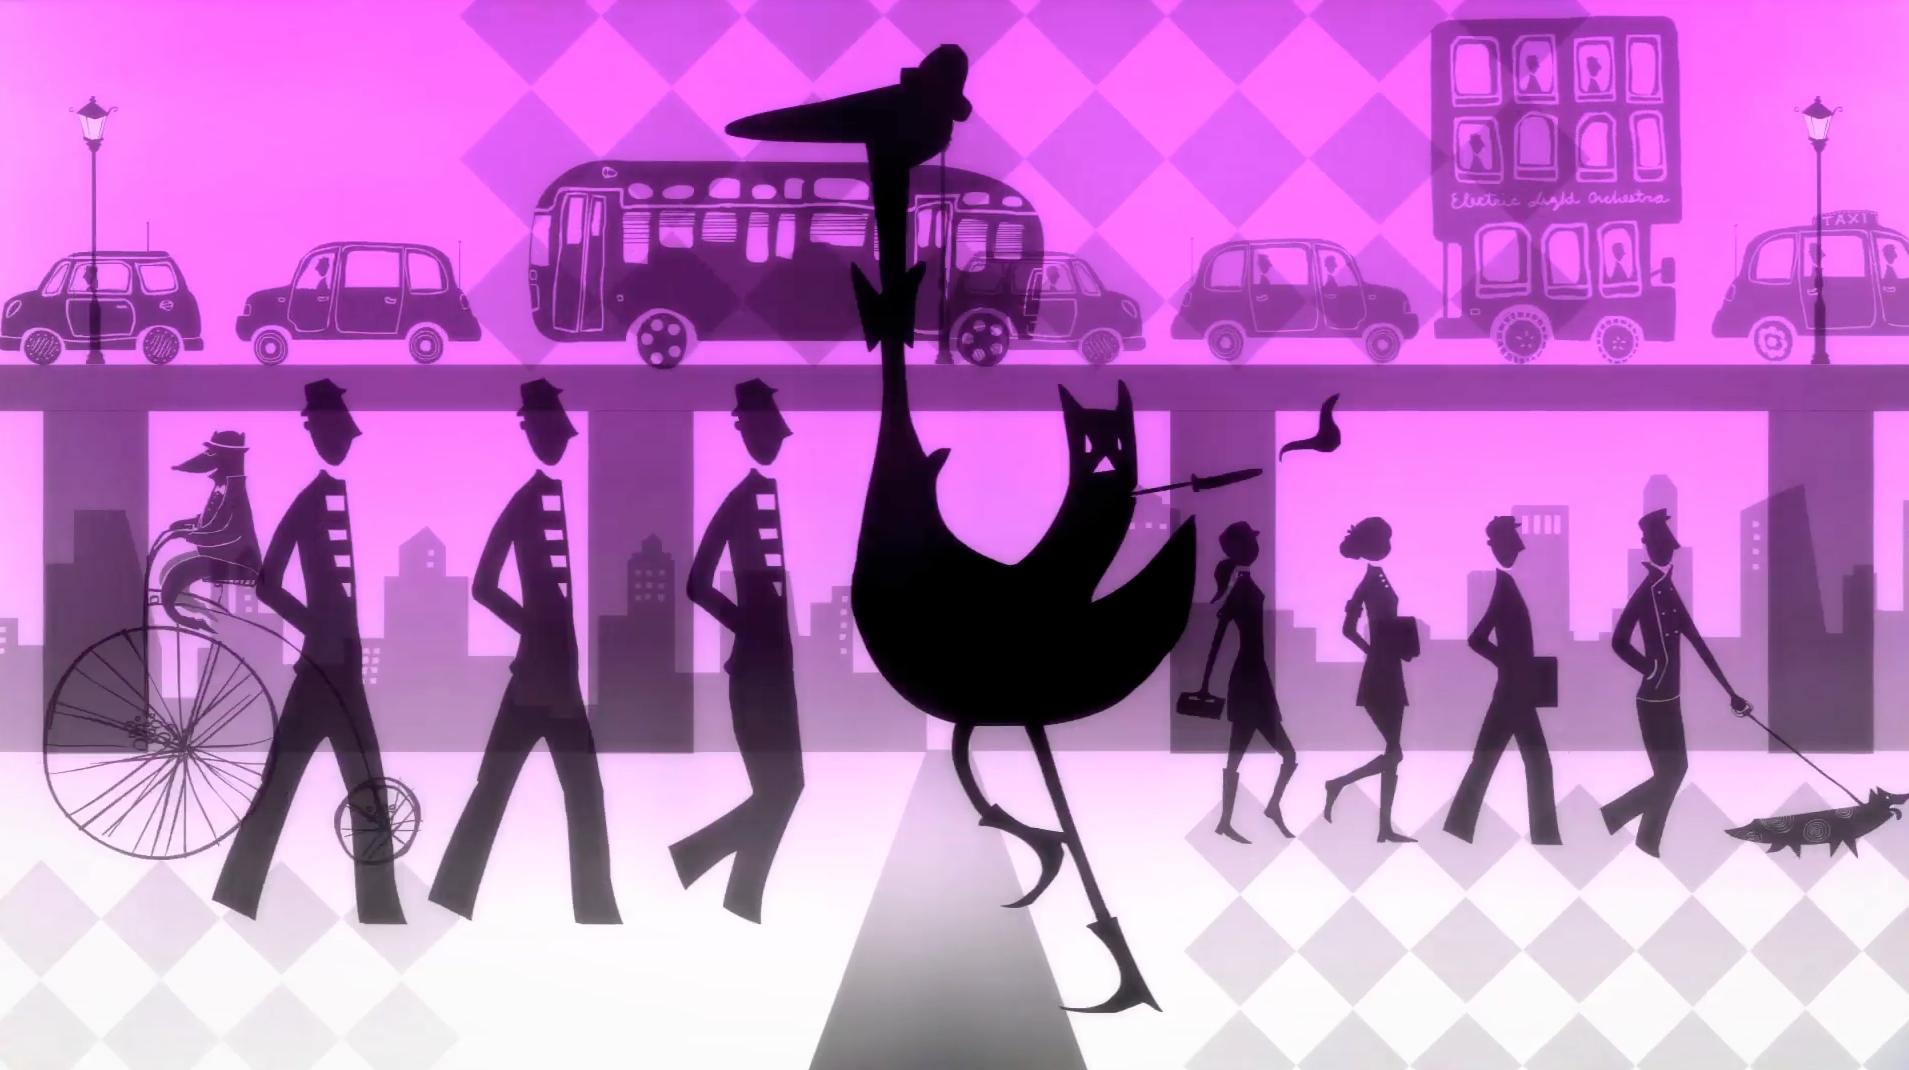 Animation by Lisa Chung